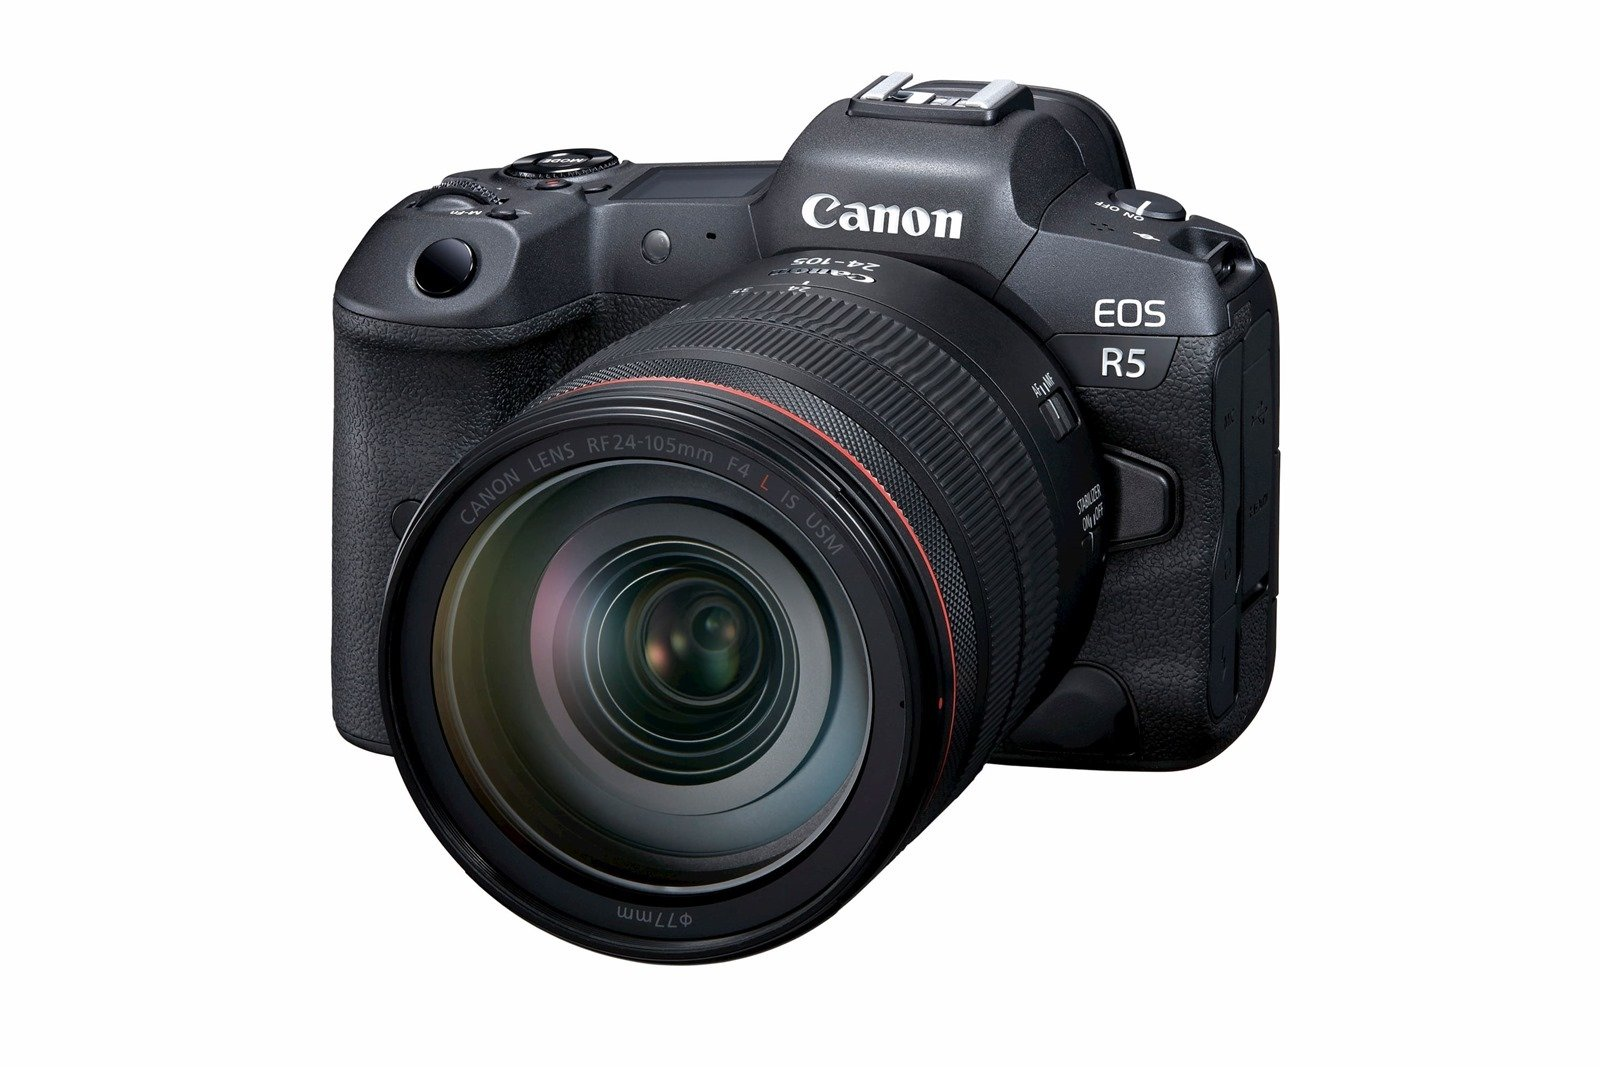 04-Canon-EOS-R5-全片幅無反光鏡相機,採用跨時代的突破性創新技術,提供強大的影像品質與穩定性,為用戶帶來全新影像創作可能_thumb.jpg @3C 達人廖阿輝